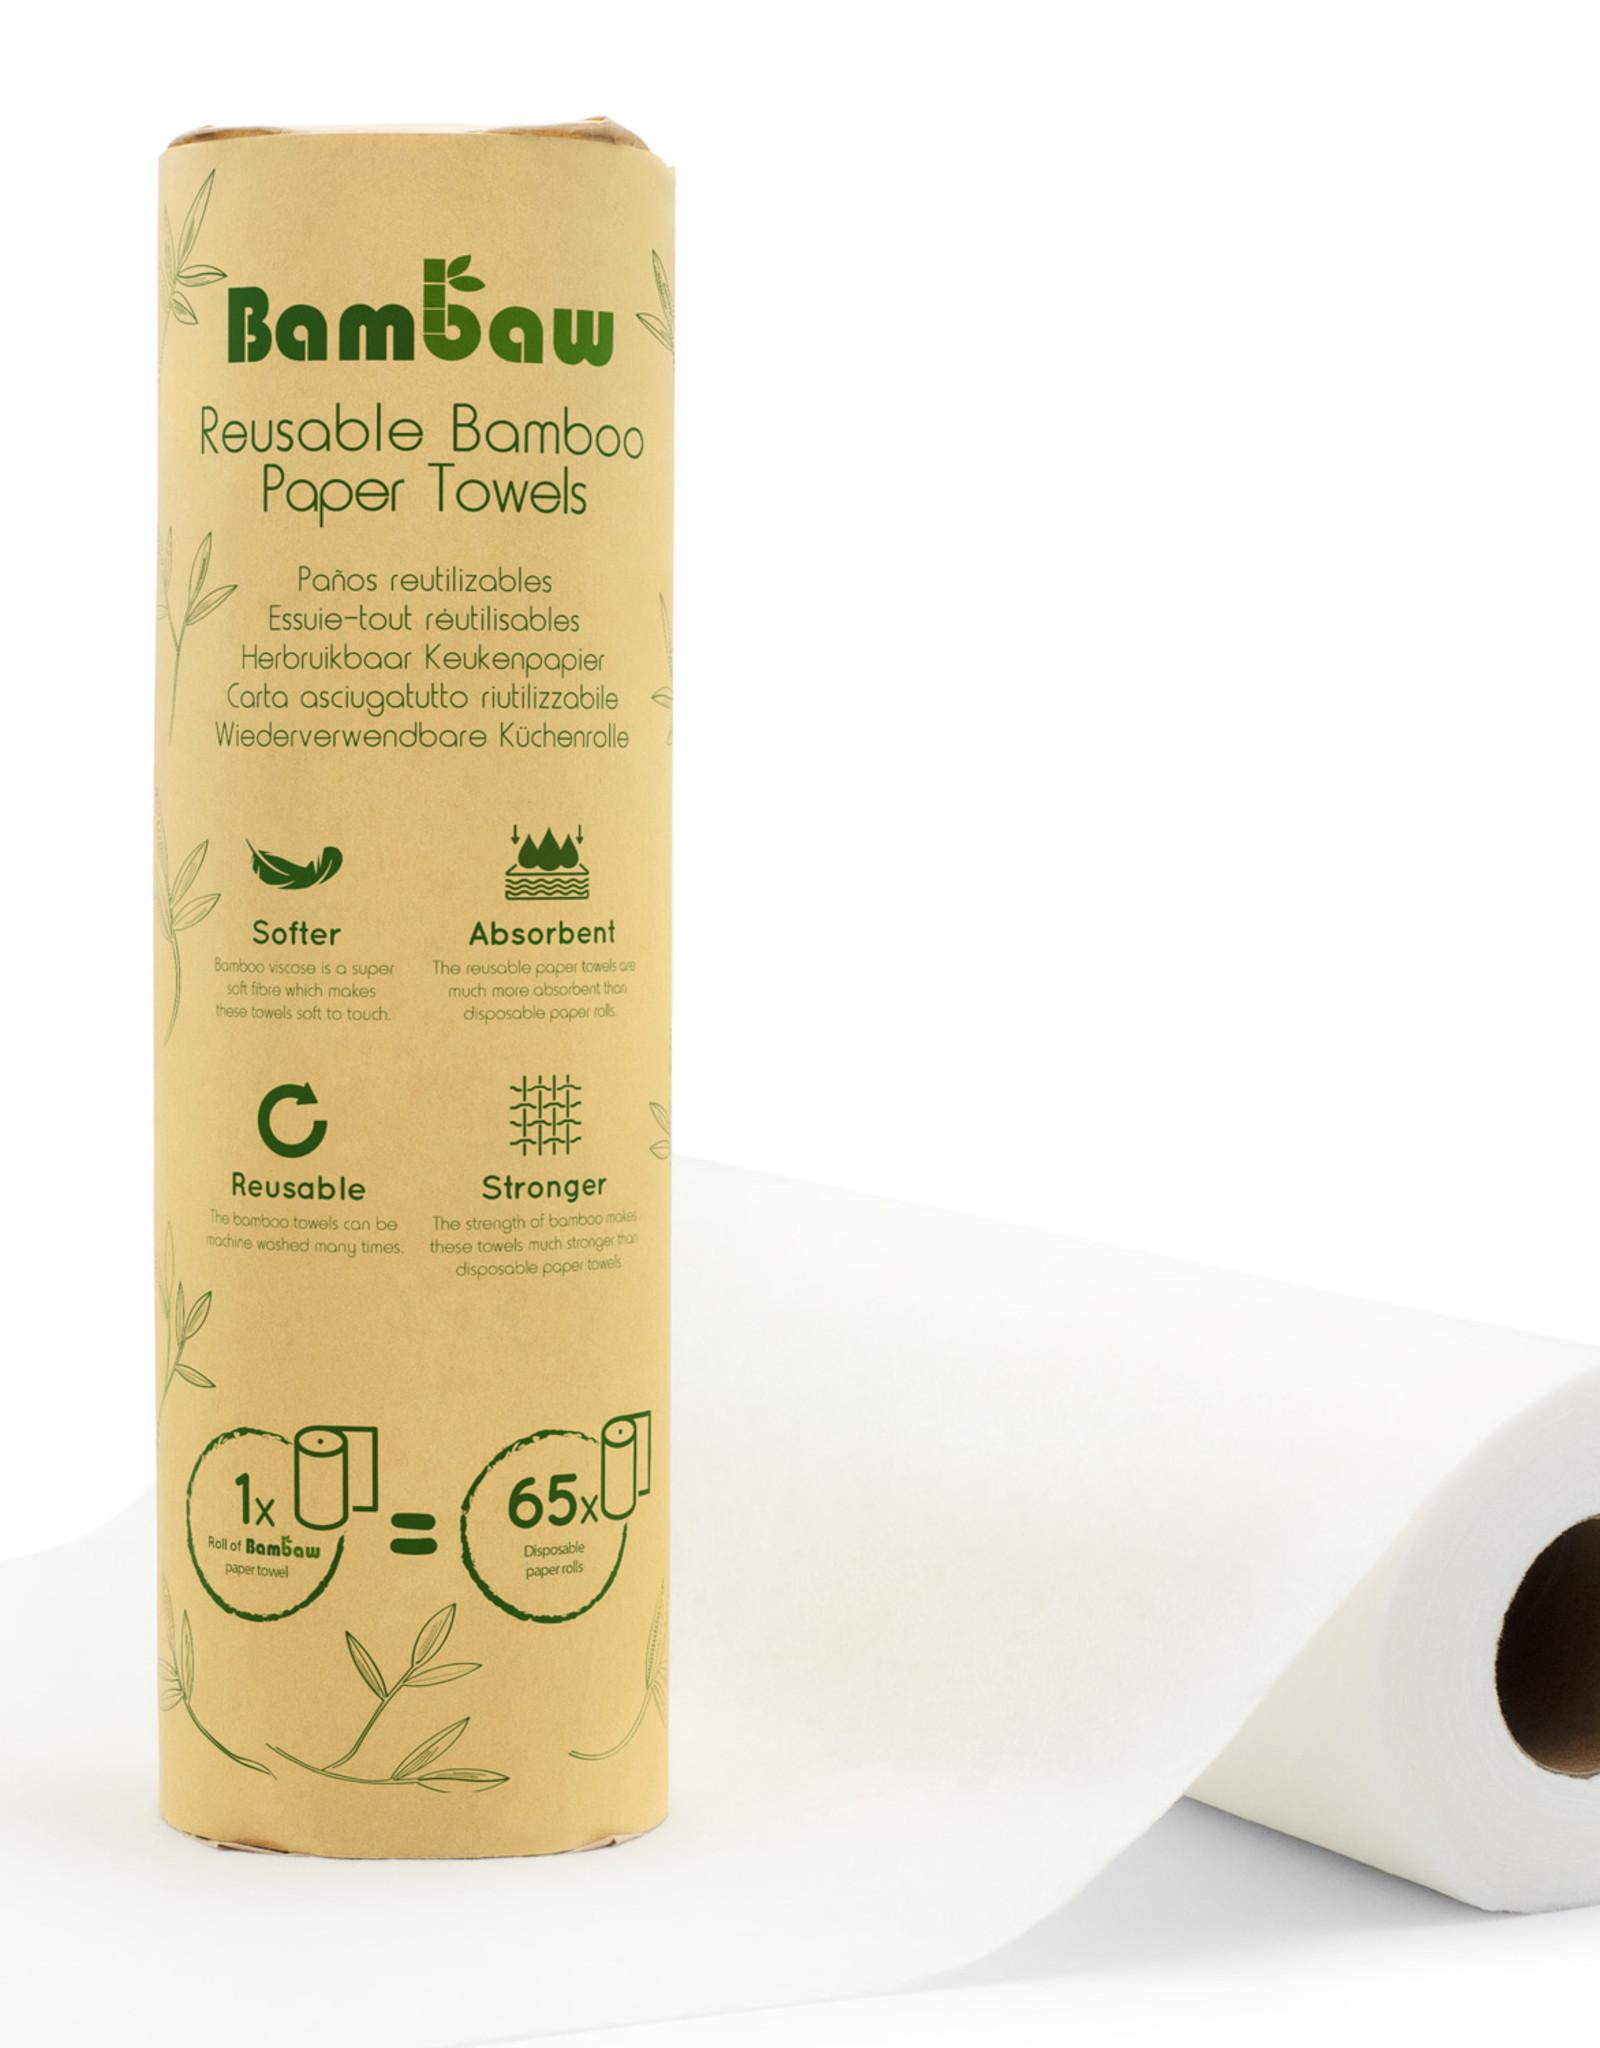 BamBaw Reusable bamboo towels